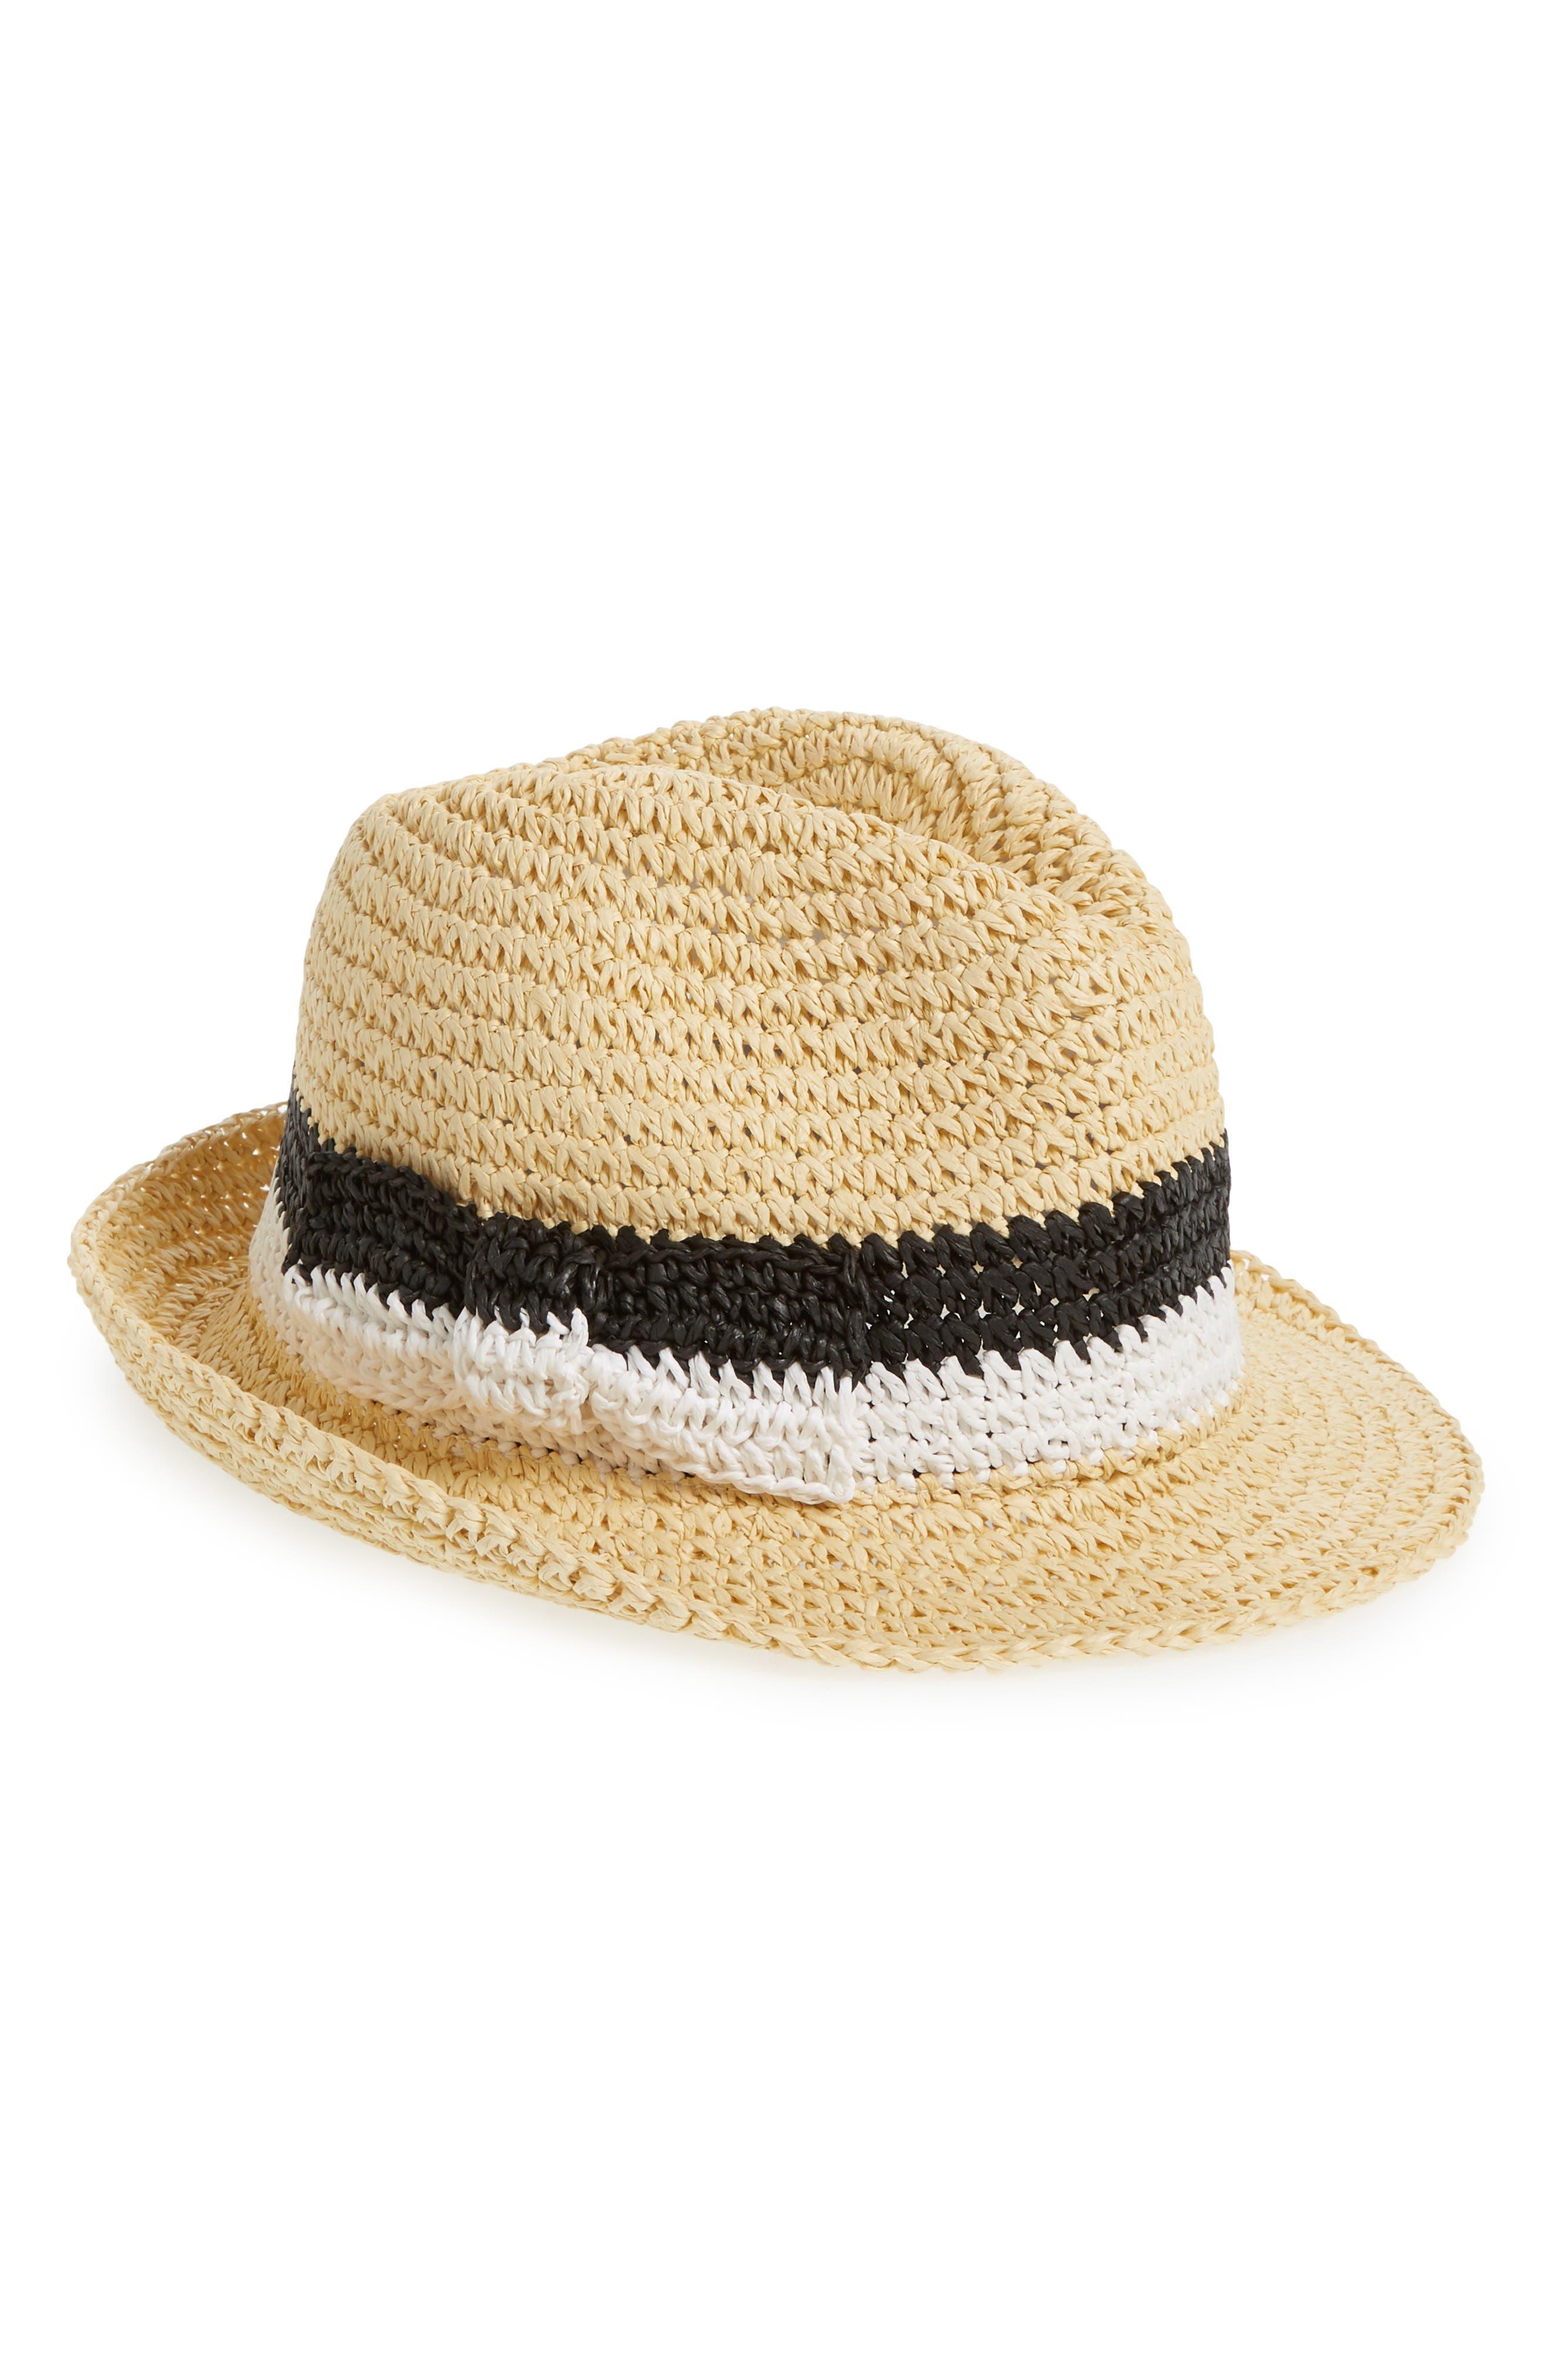 kate spade stripe bow straw trilby,                             Main thumbnail 1, color,                             Natural/ Black/ White